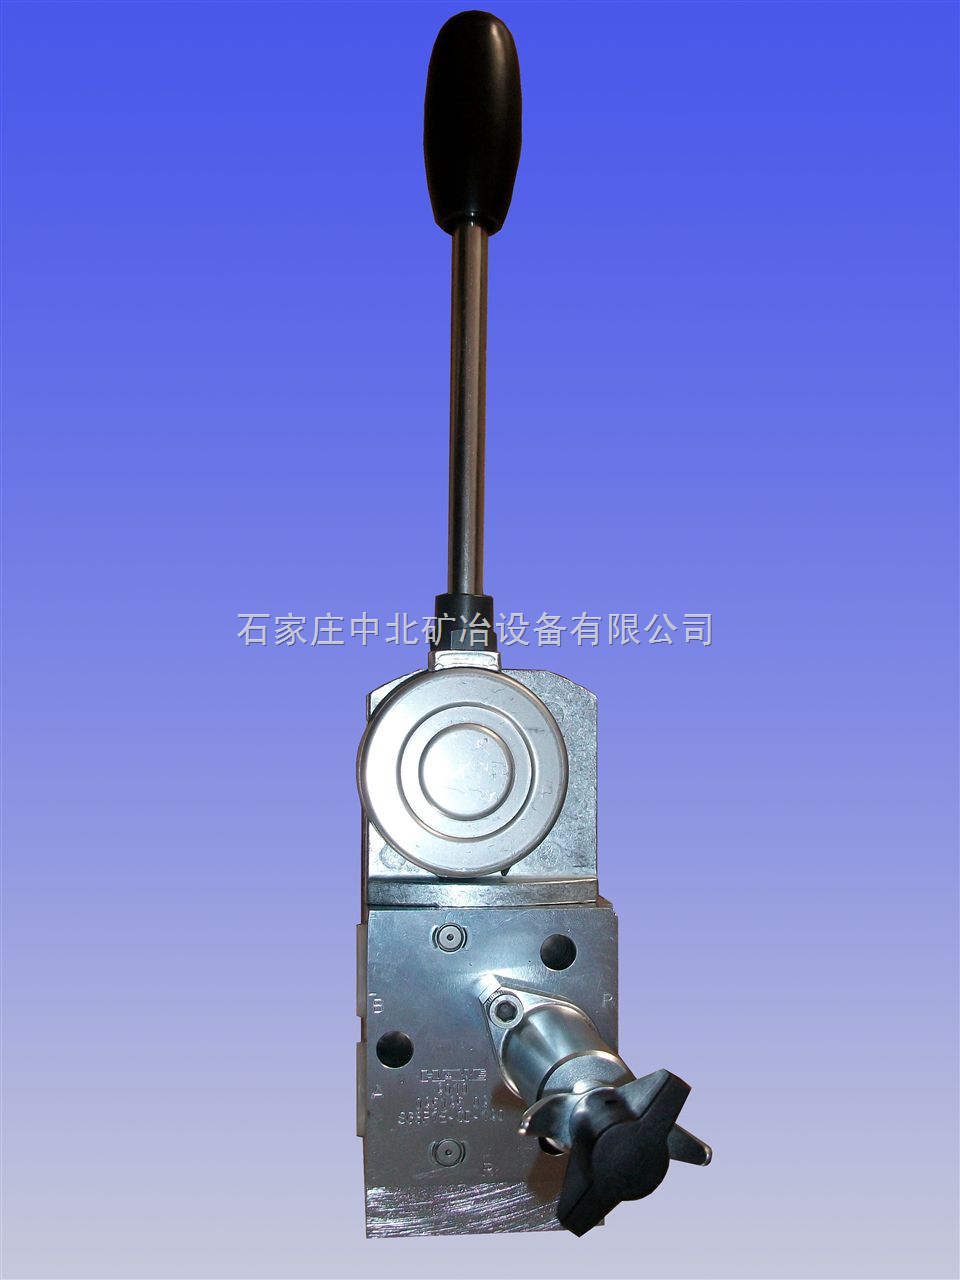 HAWE哈威SG3P7E-CD-160手动换向阀